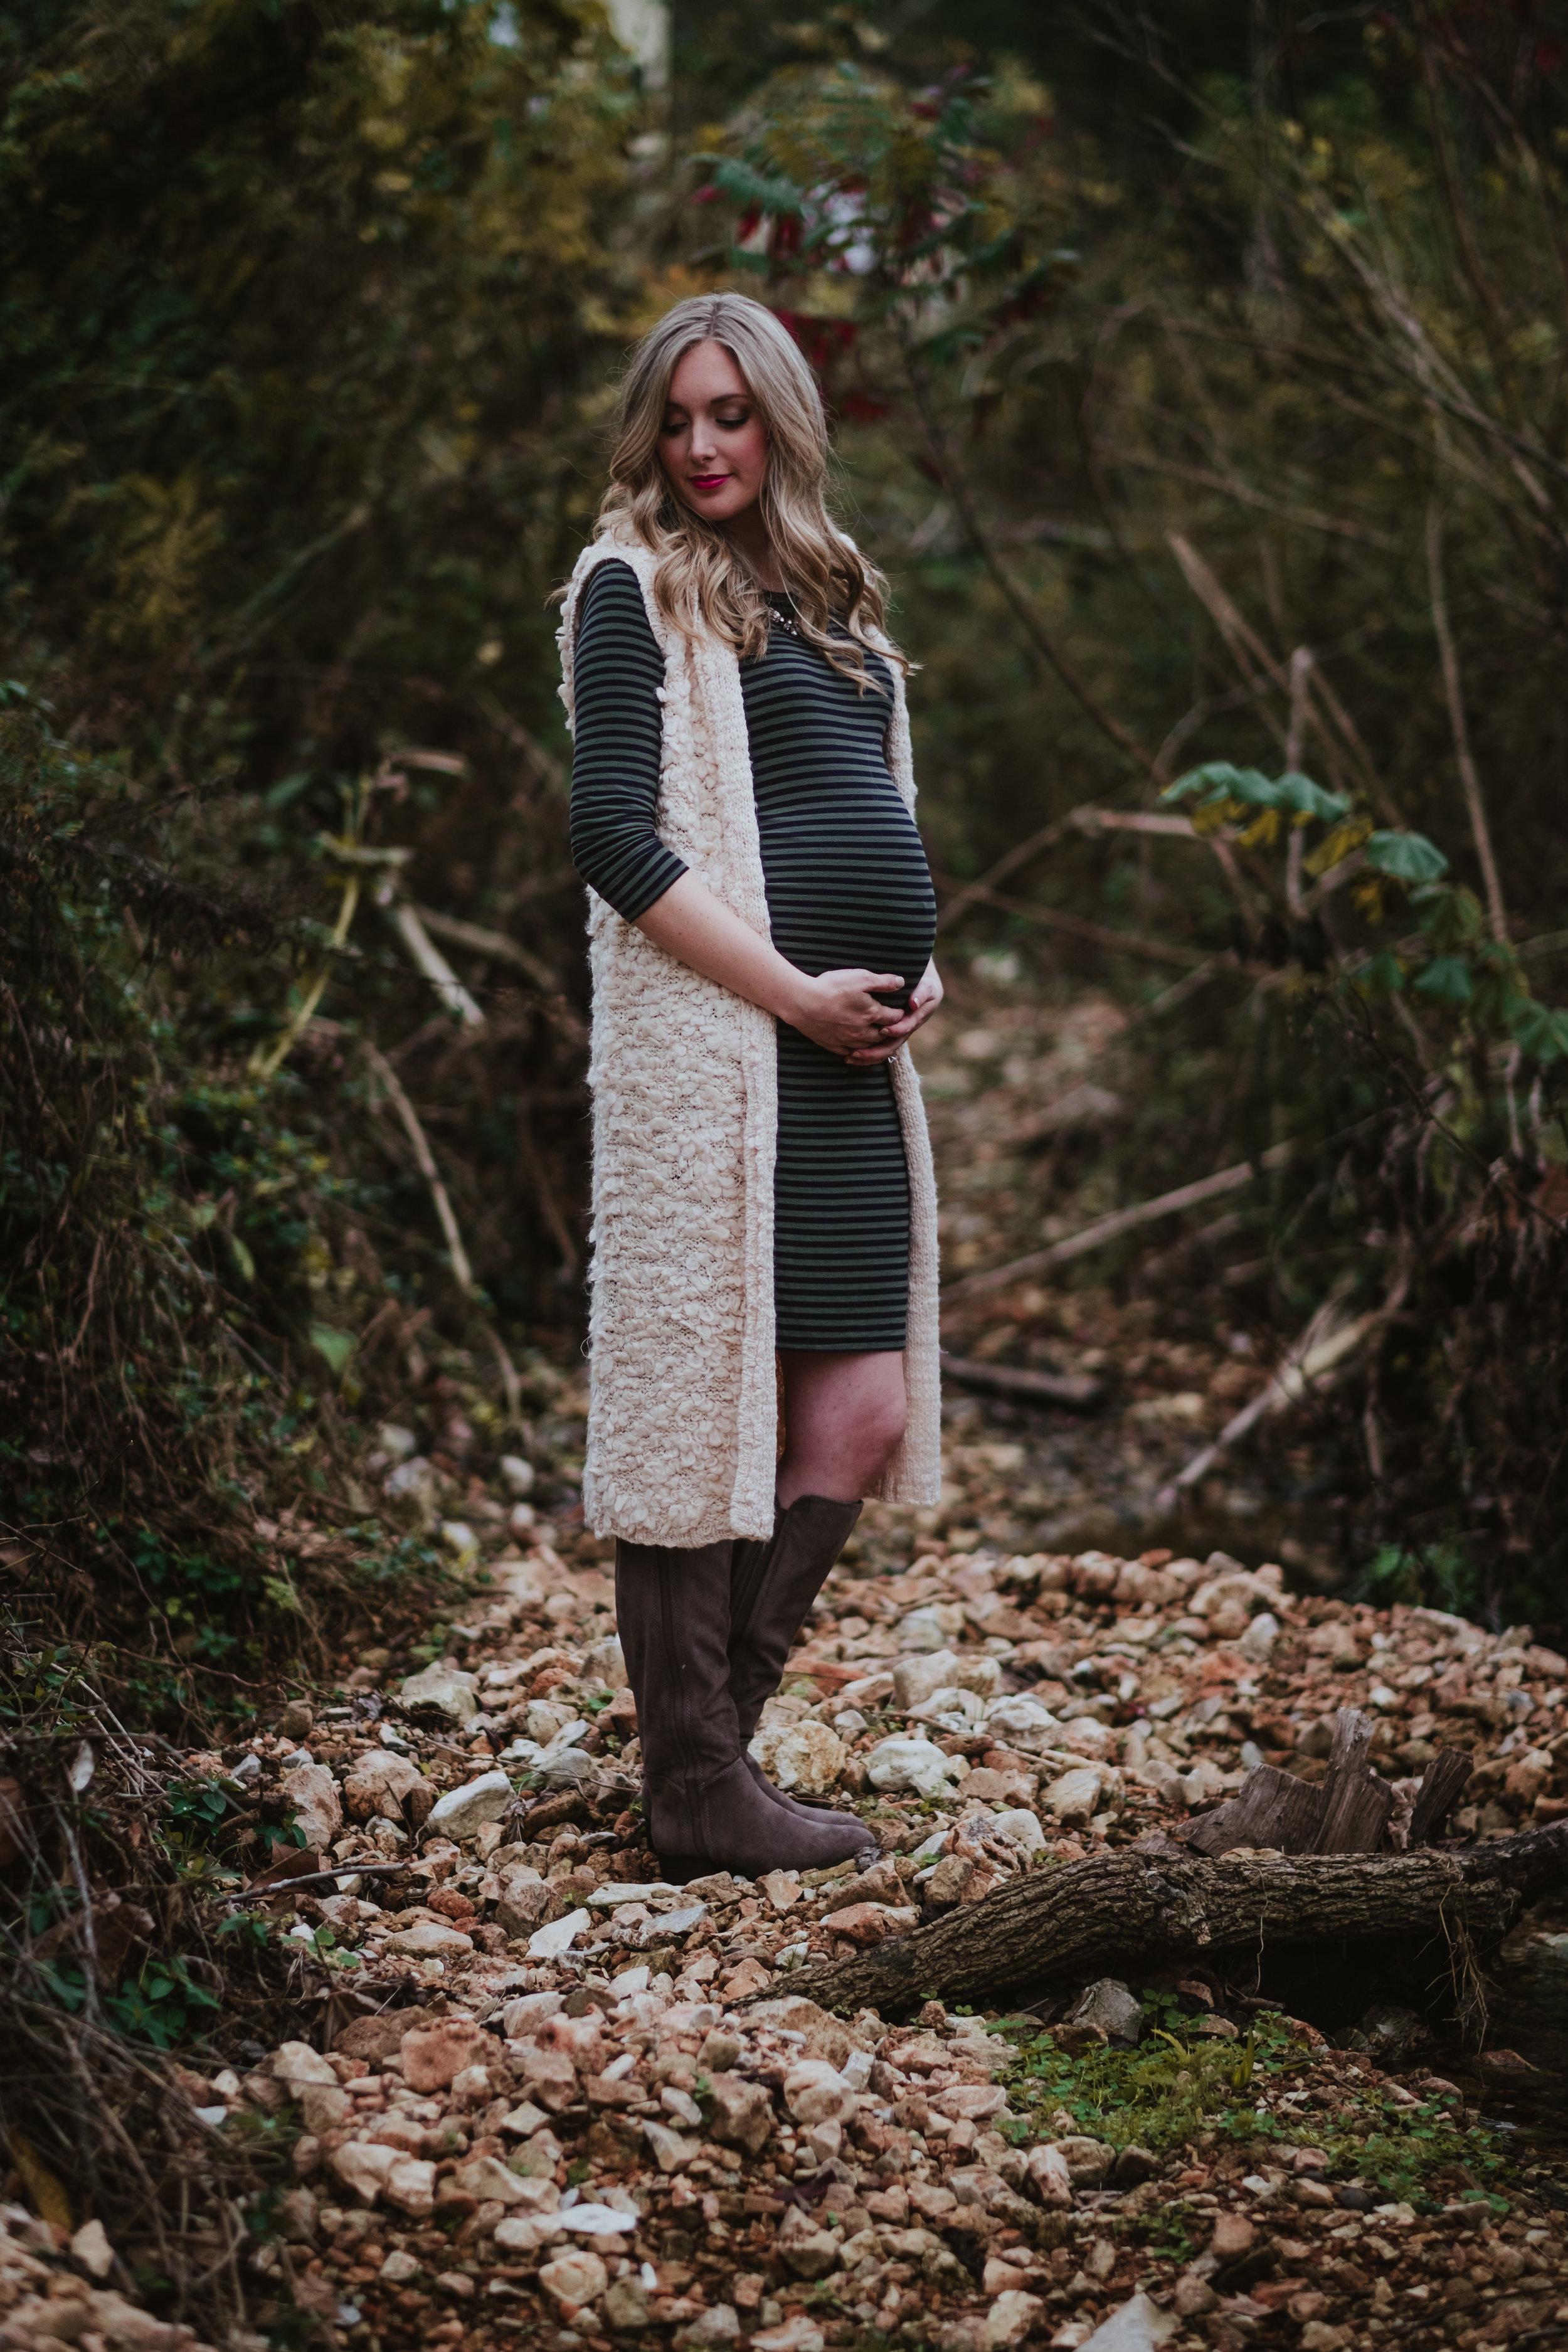 Micah.Chris.Maternity.2016.Delyn.Megan.Stirewalt-30.jpg